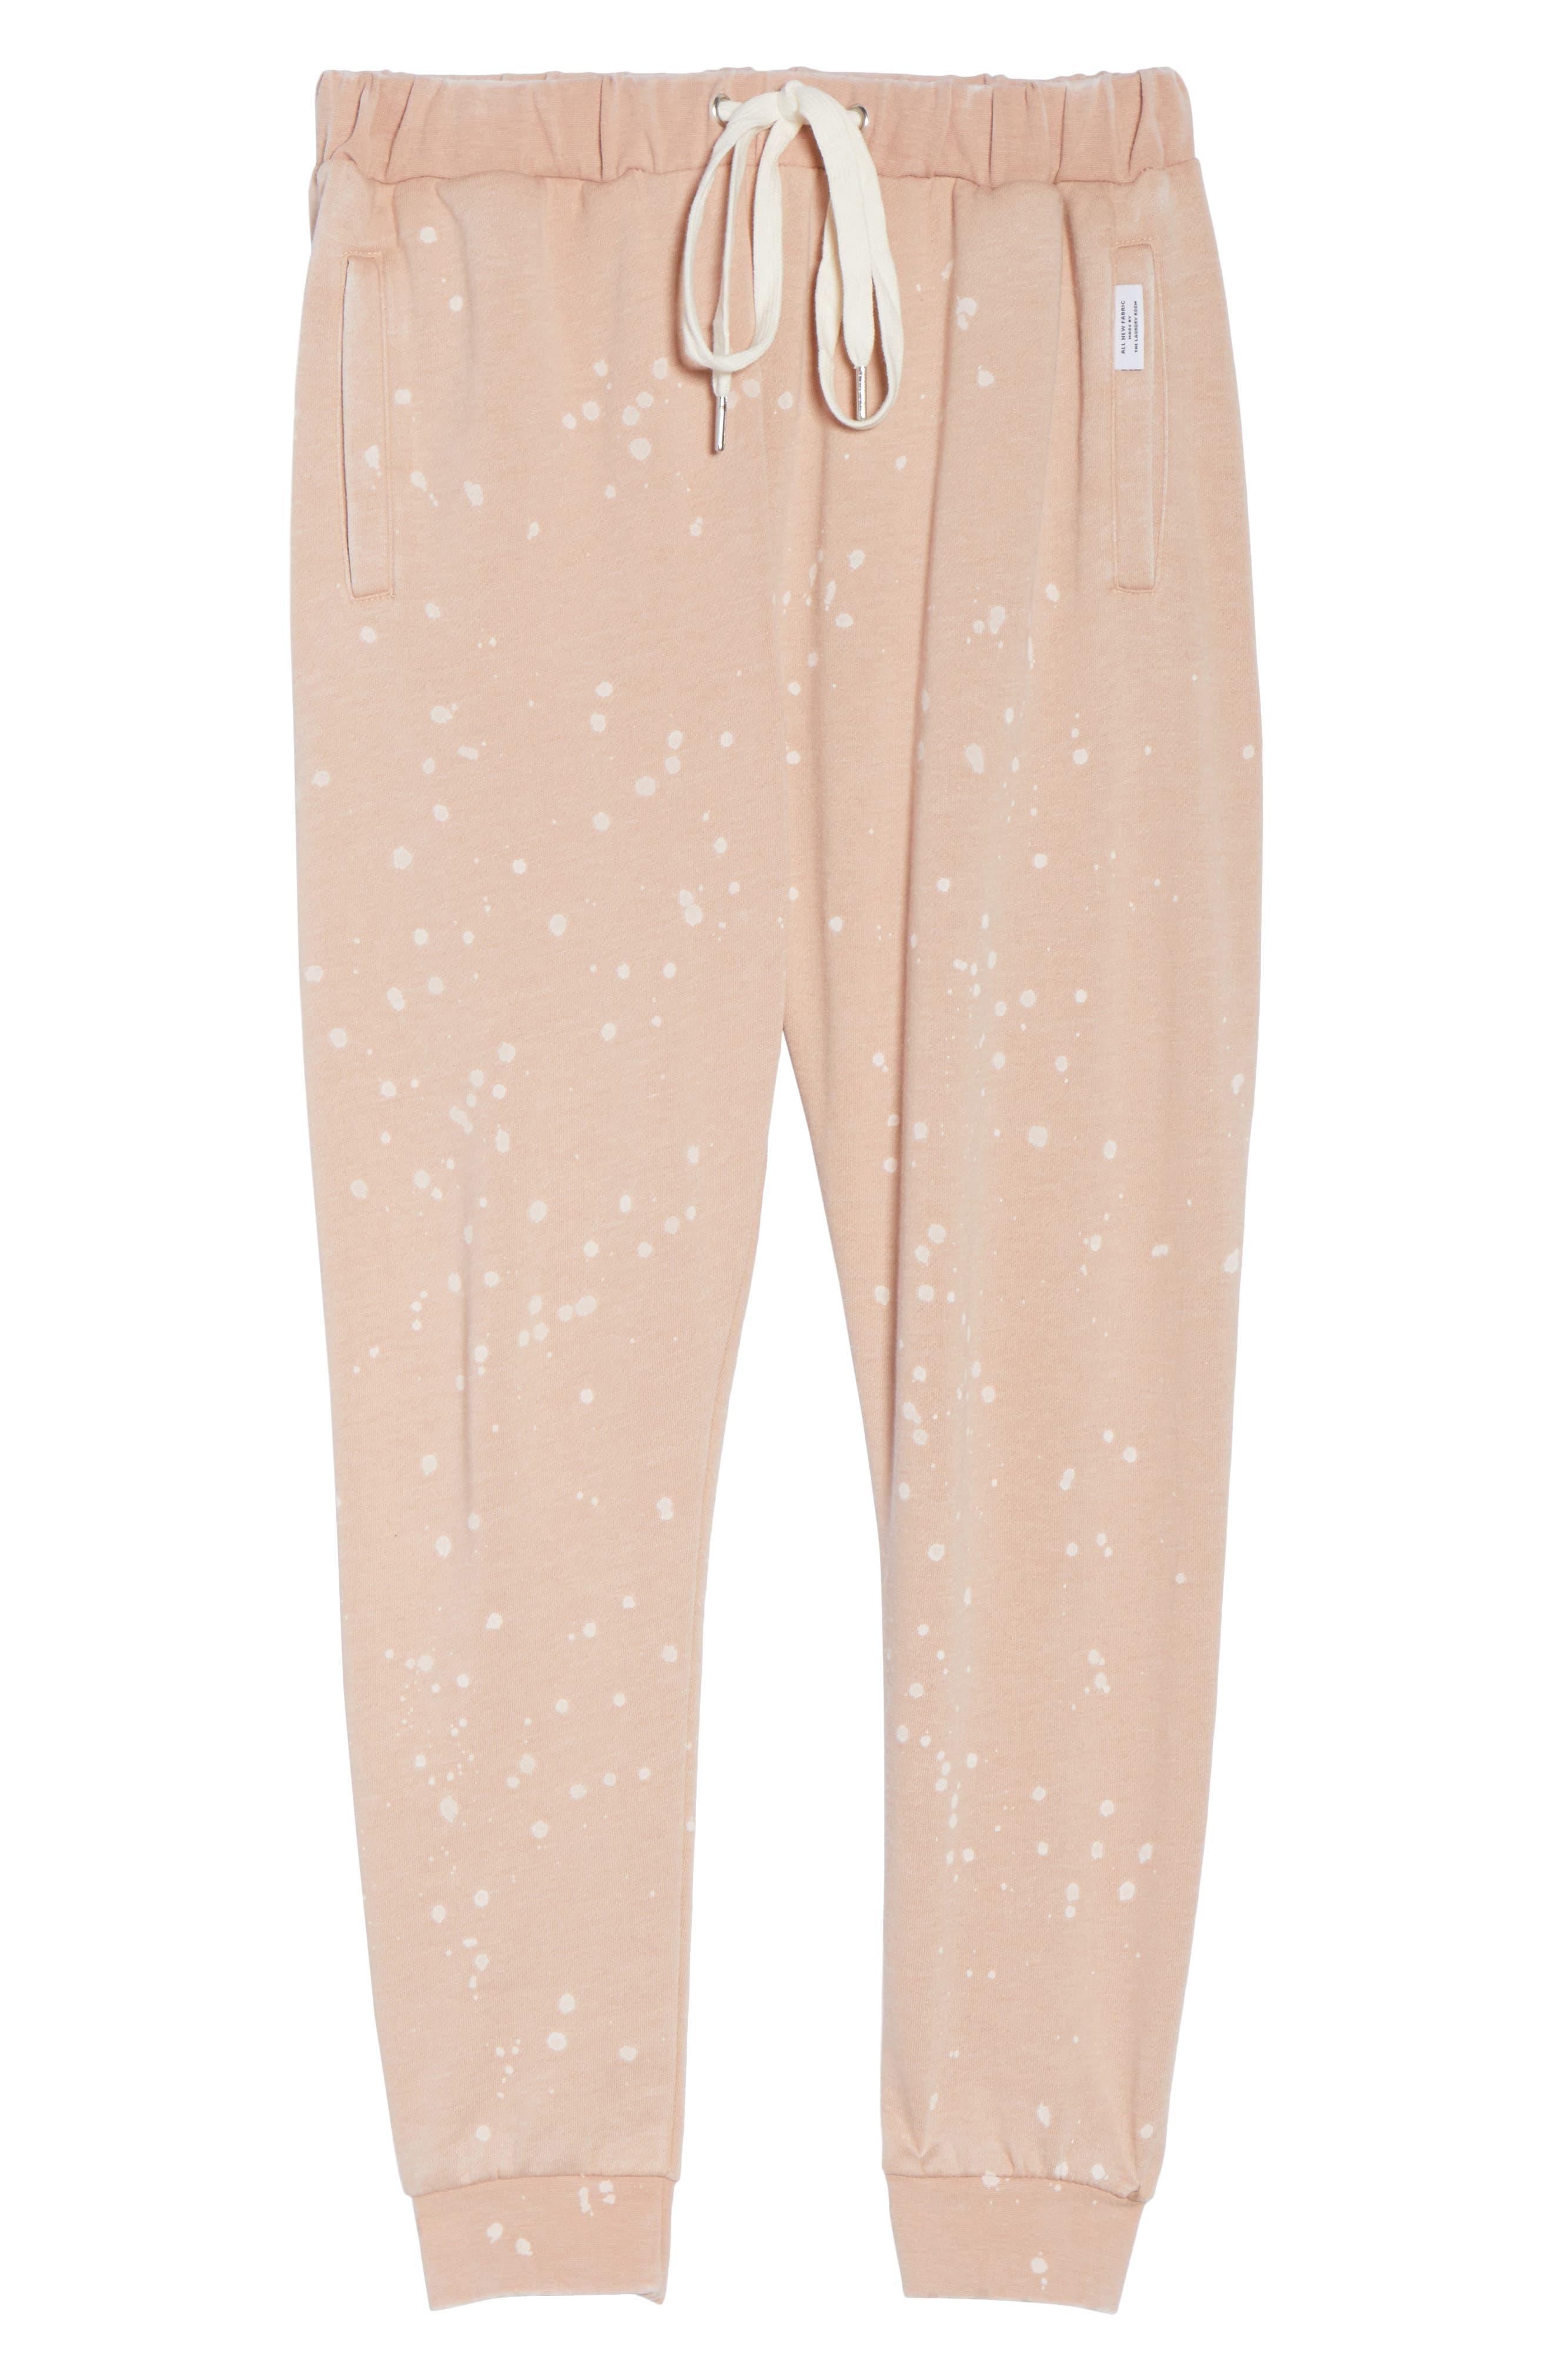 Lounge Pants,                             Alternate thumbnail 4, color,                             Shroom Speckle